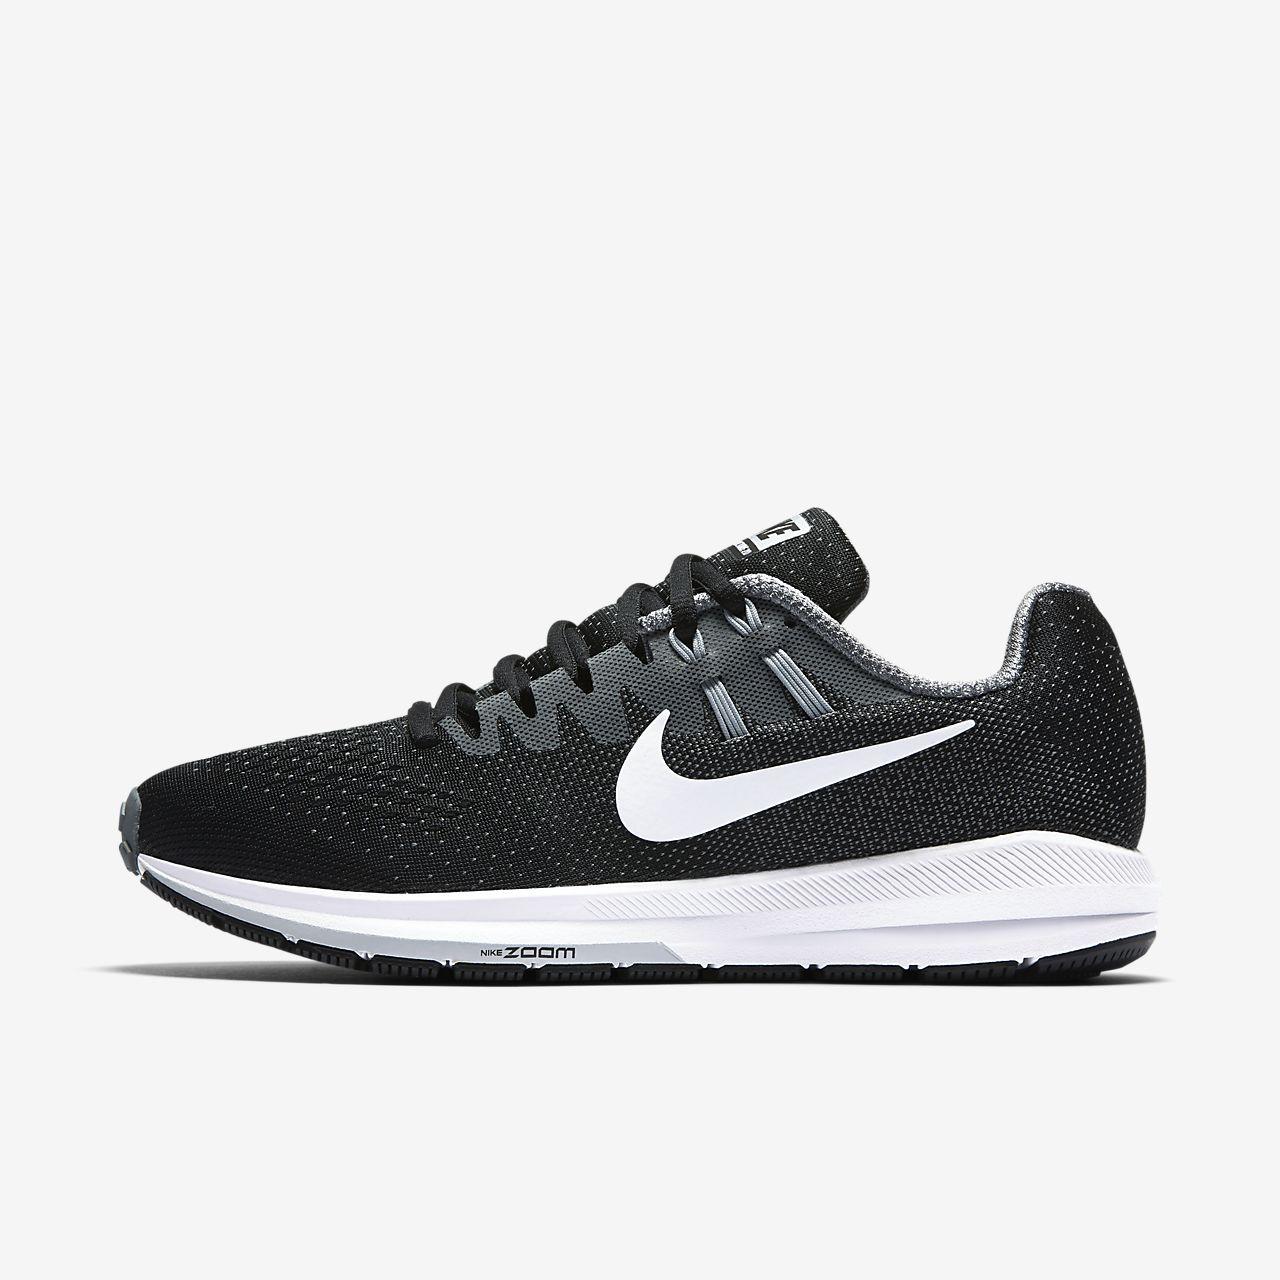 NIKE Air Zoom Structure 20 Uomo Scarpe Sneaker Scarpe DA RUNNING RUNNING NUOVO